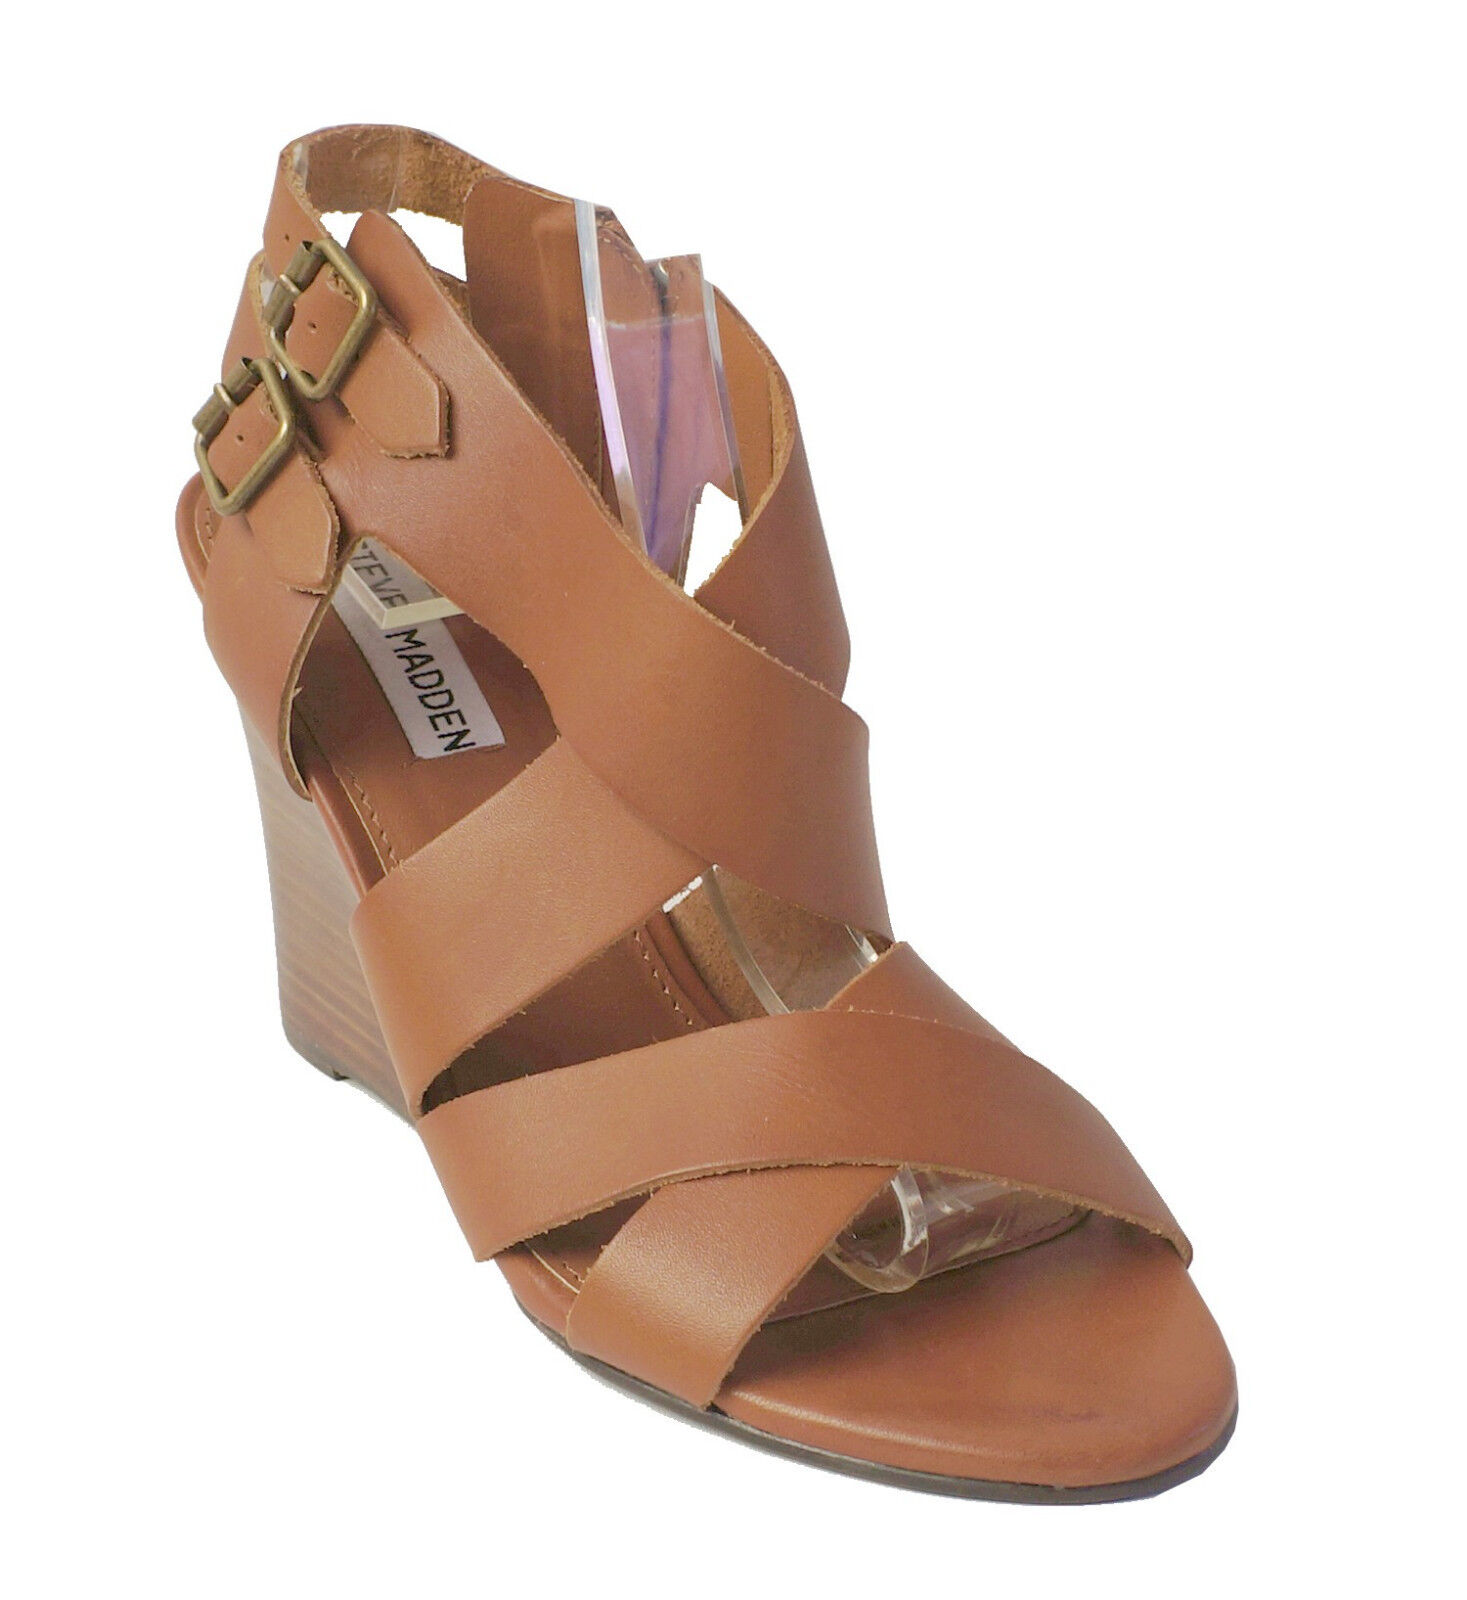 Steve Madde Marron Sandales Cuir Cityline Femmes Chaussures 8.5